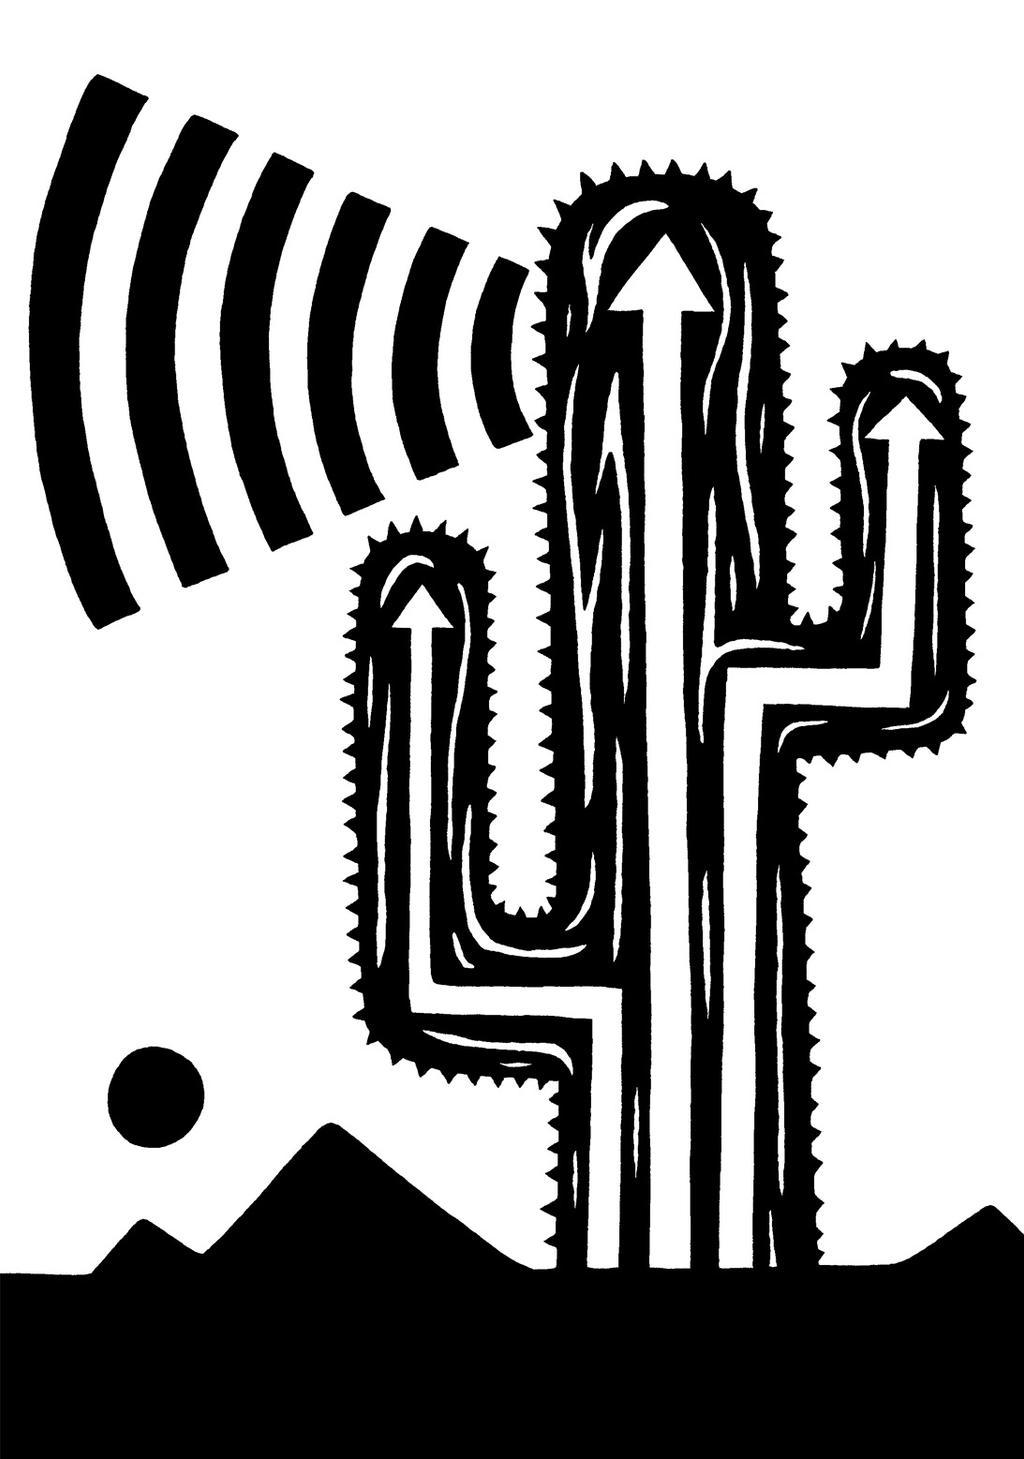 KaktusKast 01